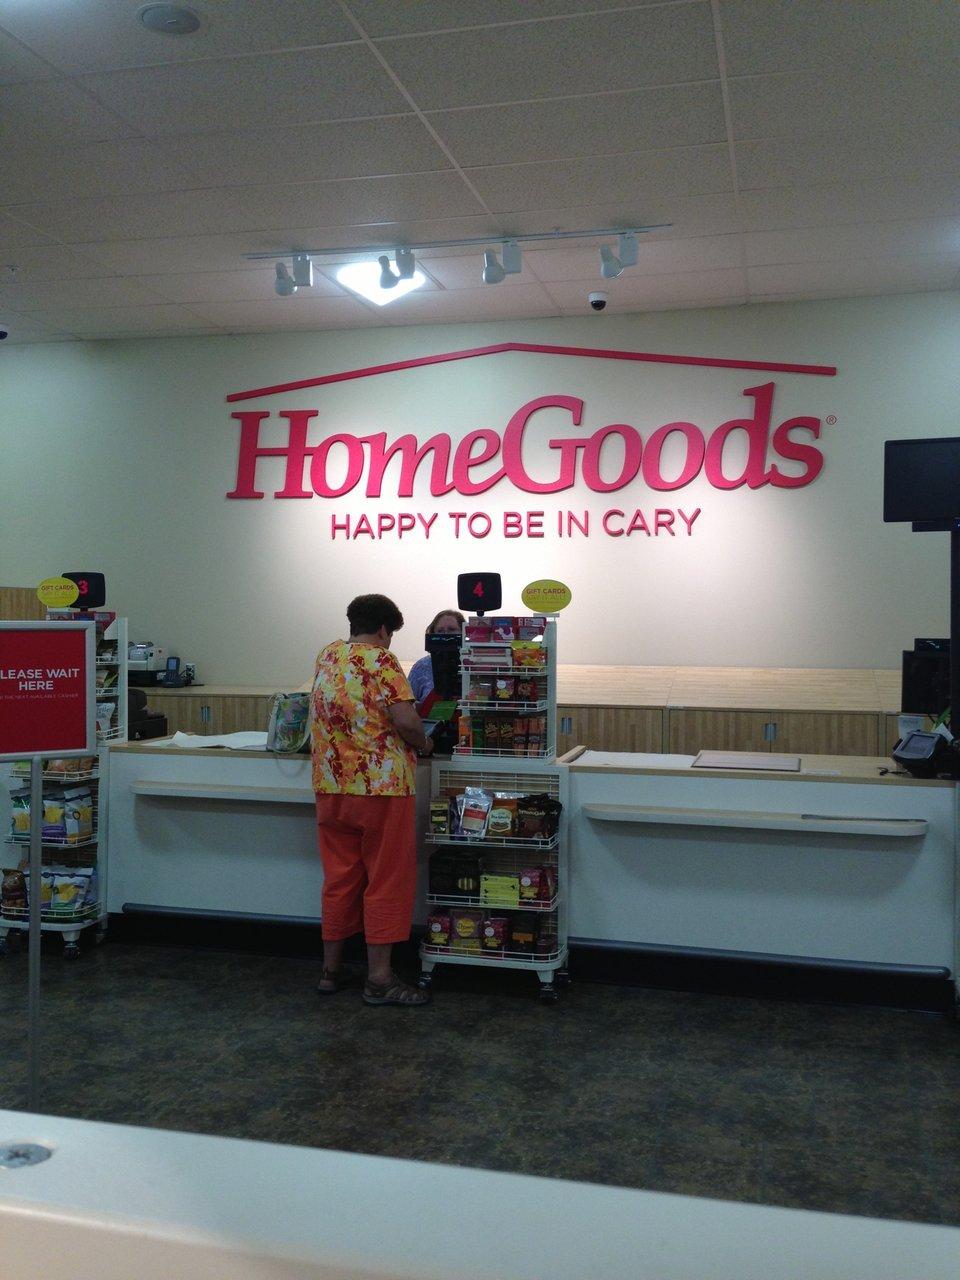 HomeGoods 255 Crossroads Blvd, Cary